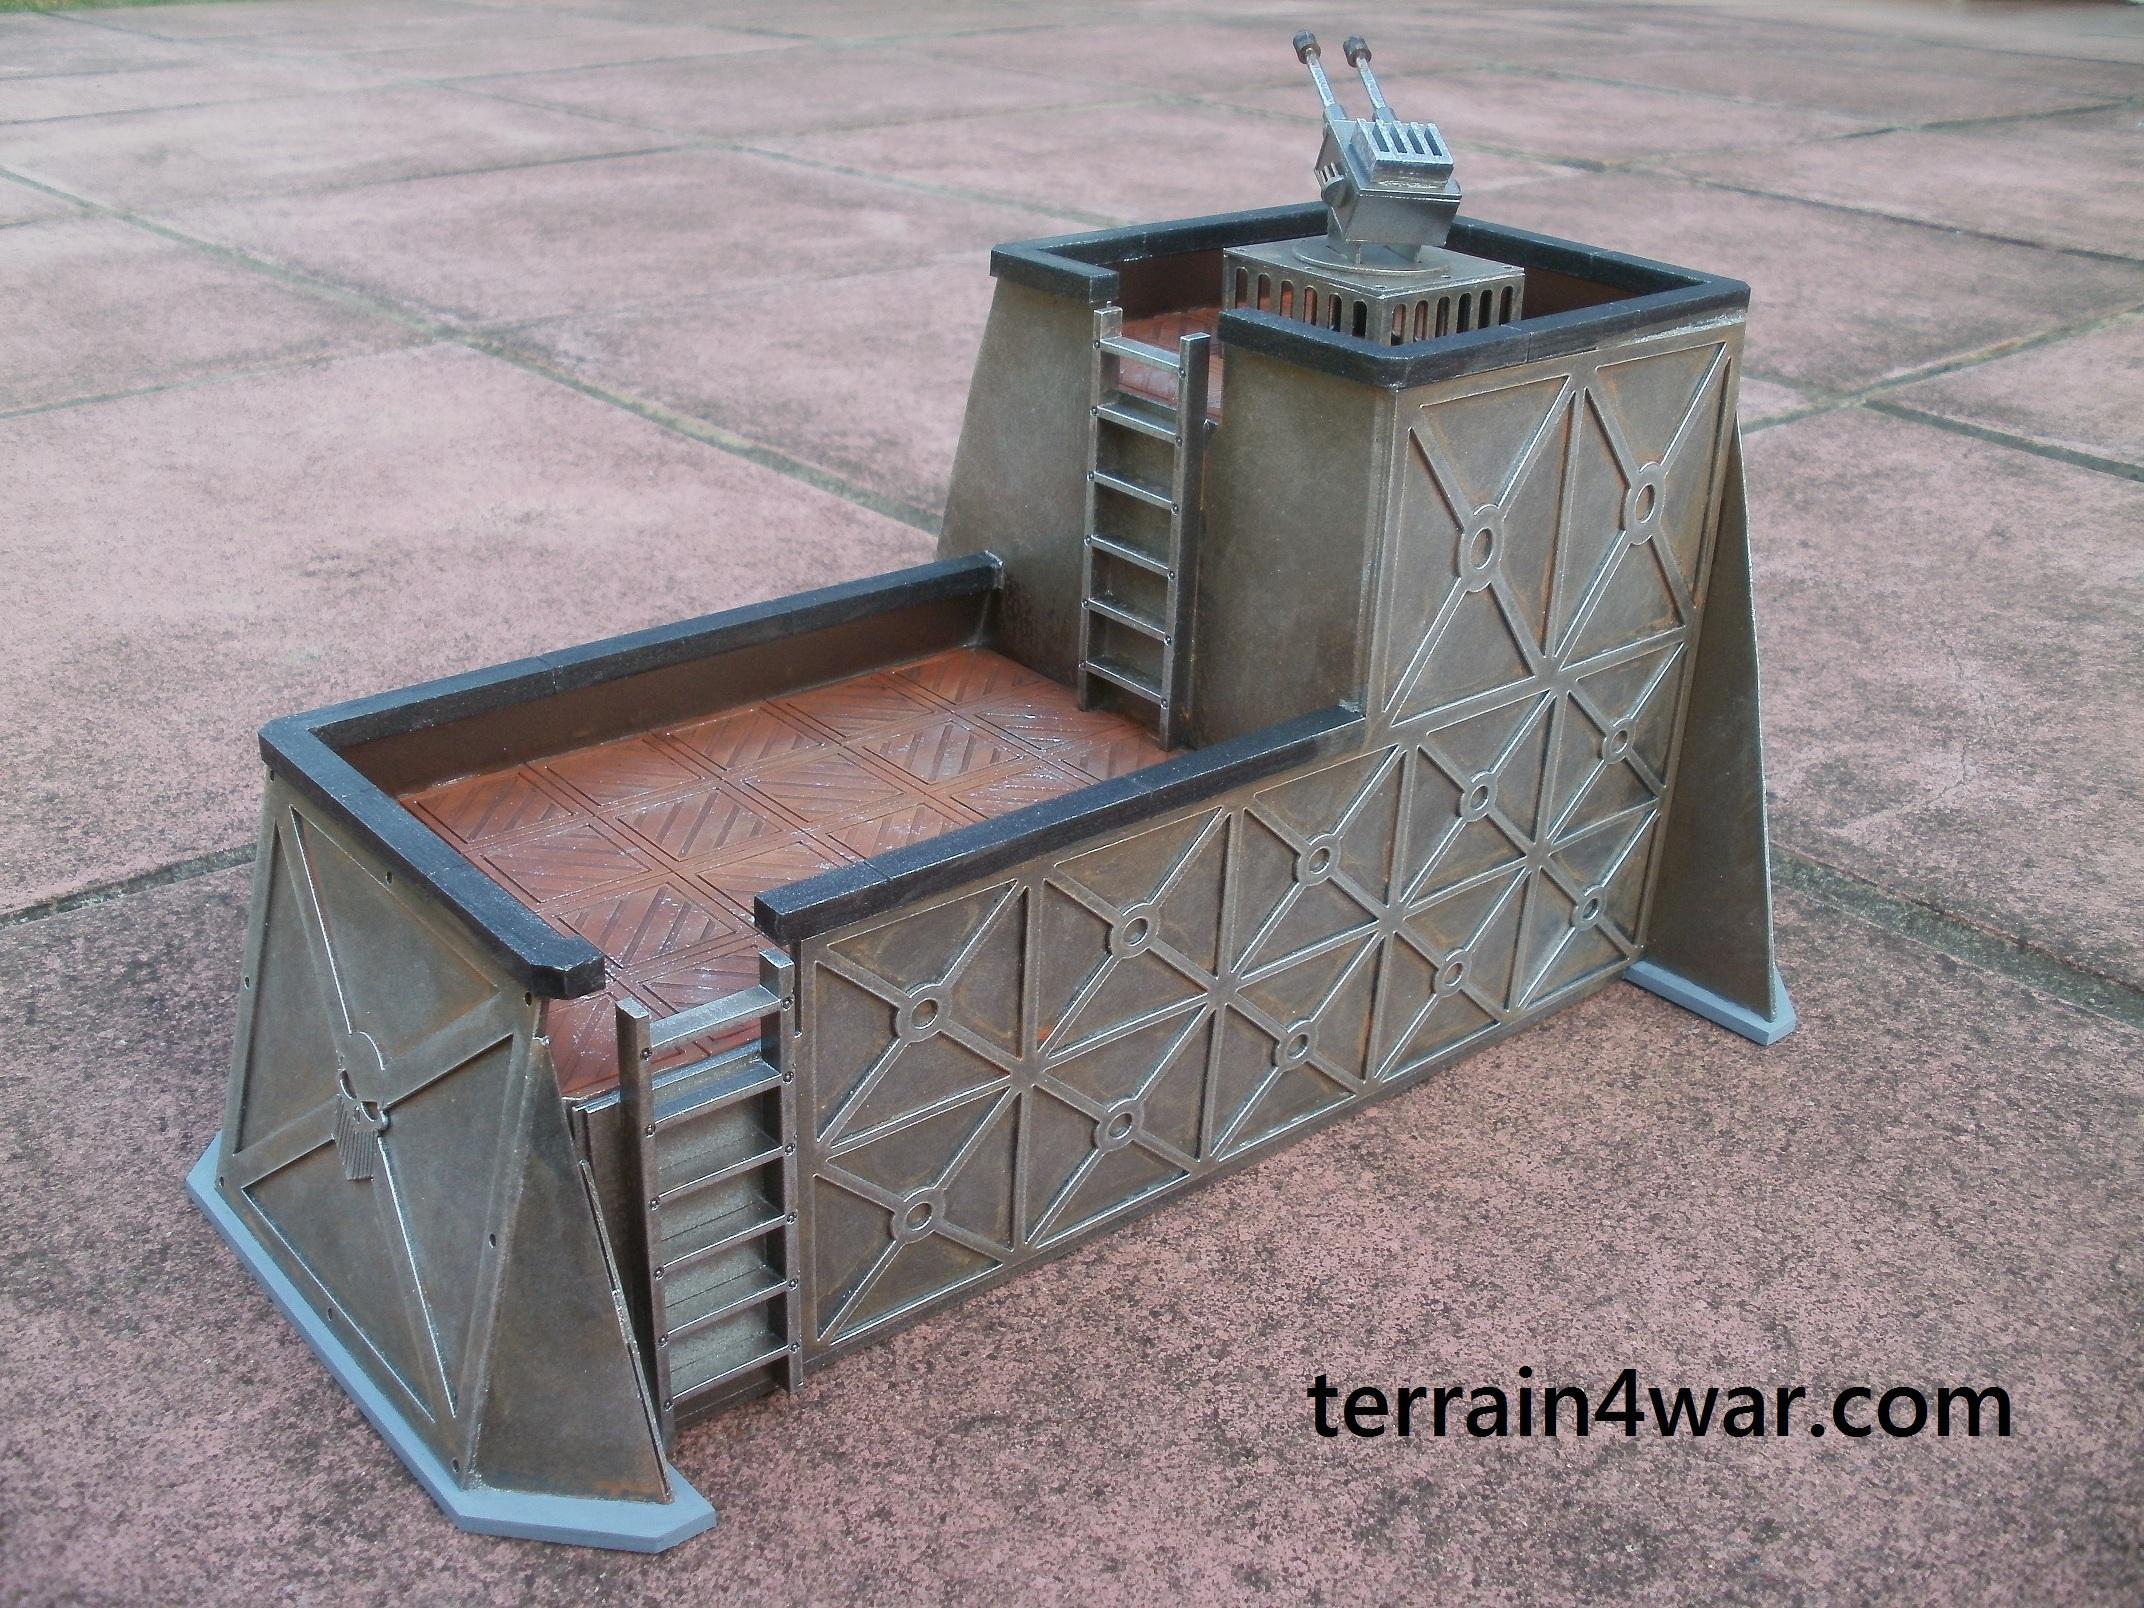 Buildings, Bunker, City, Stronghold, Terrain, Terrain4war